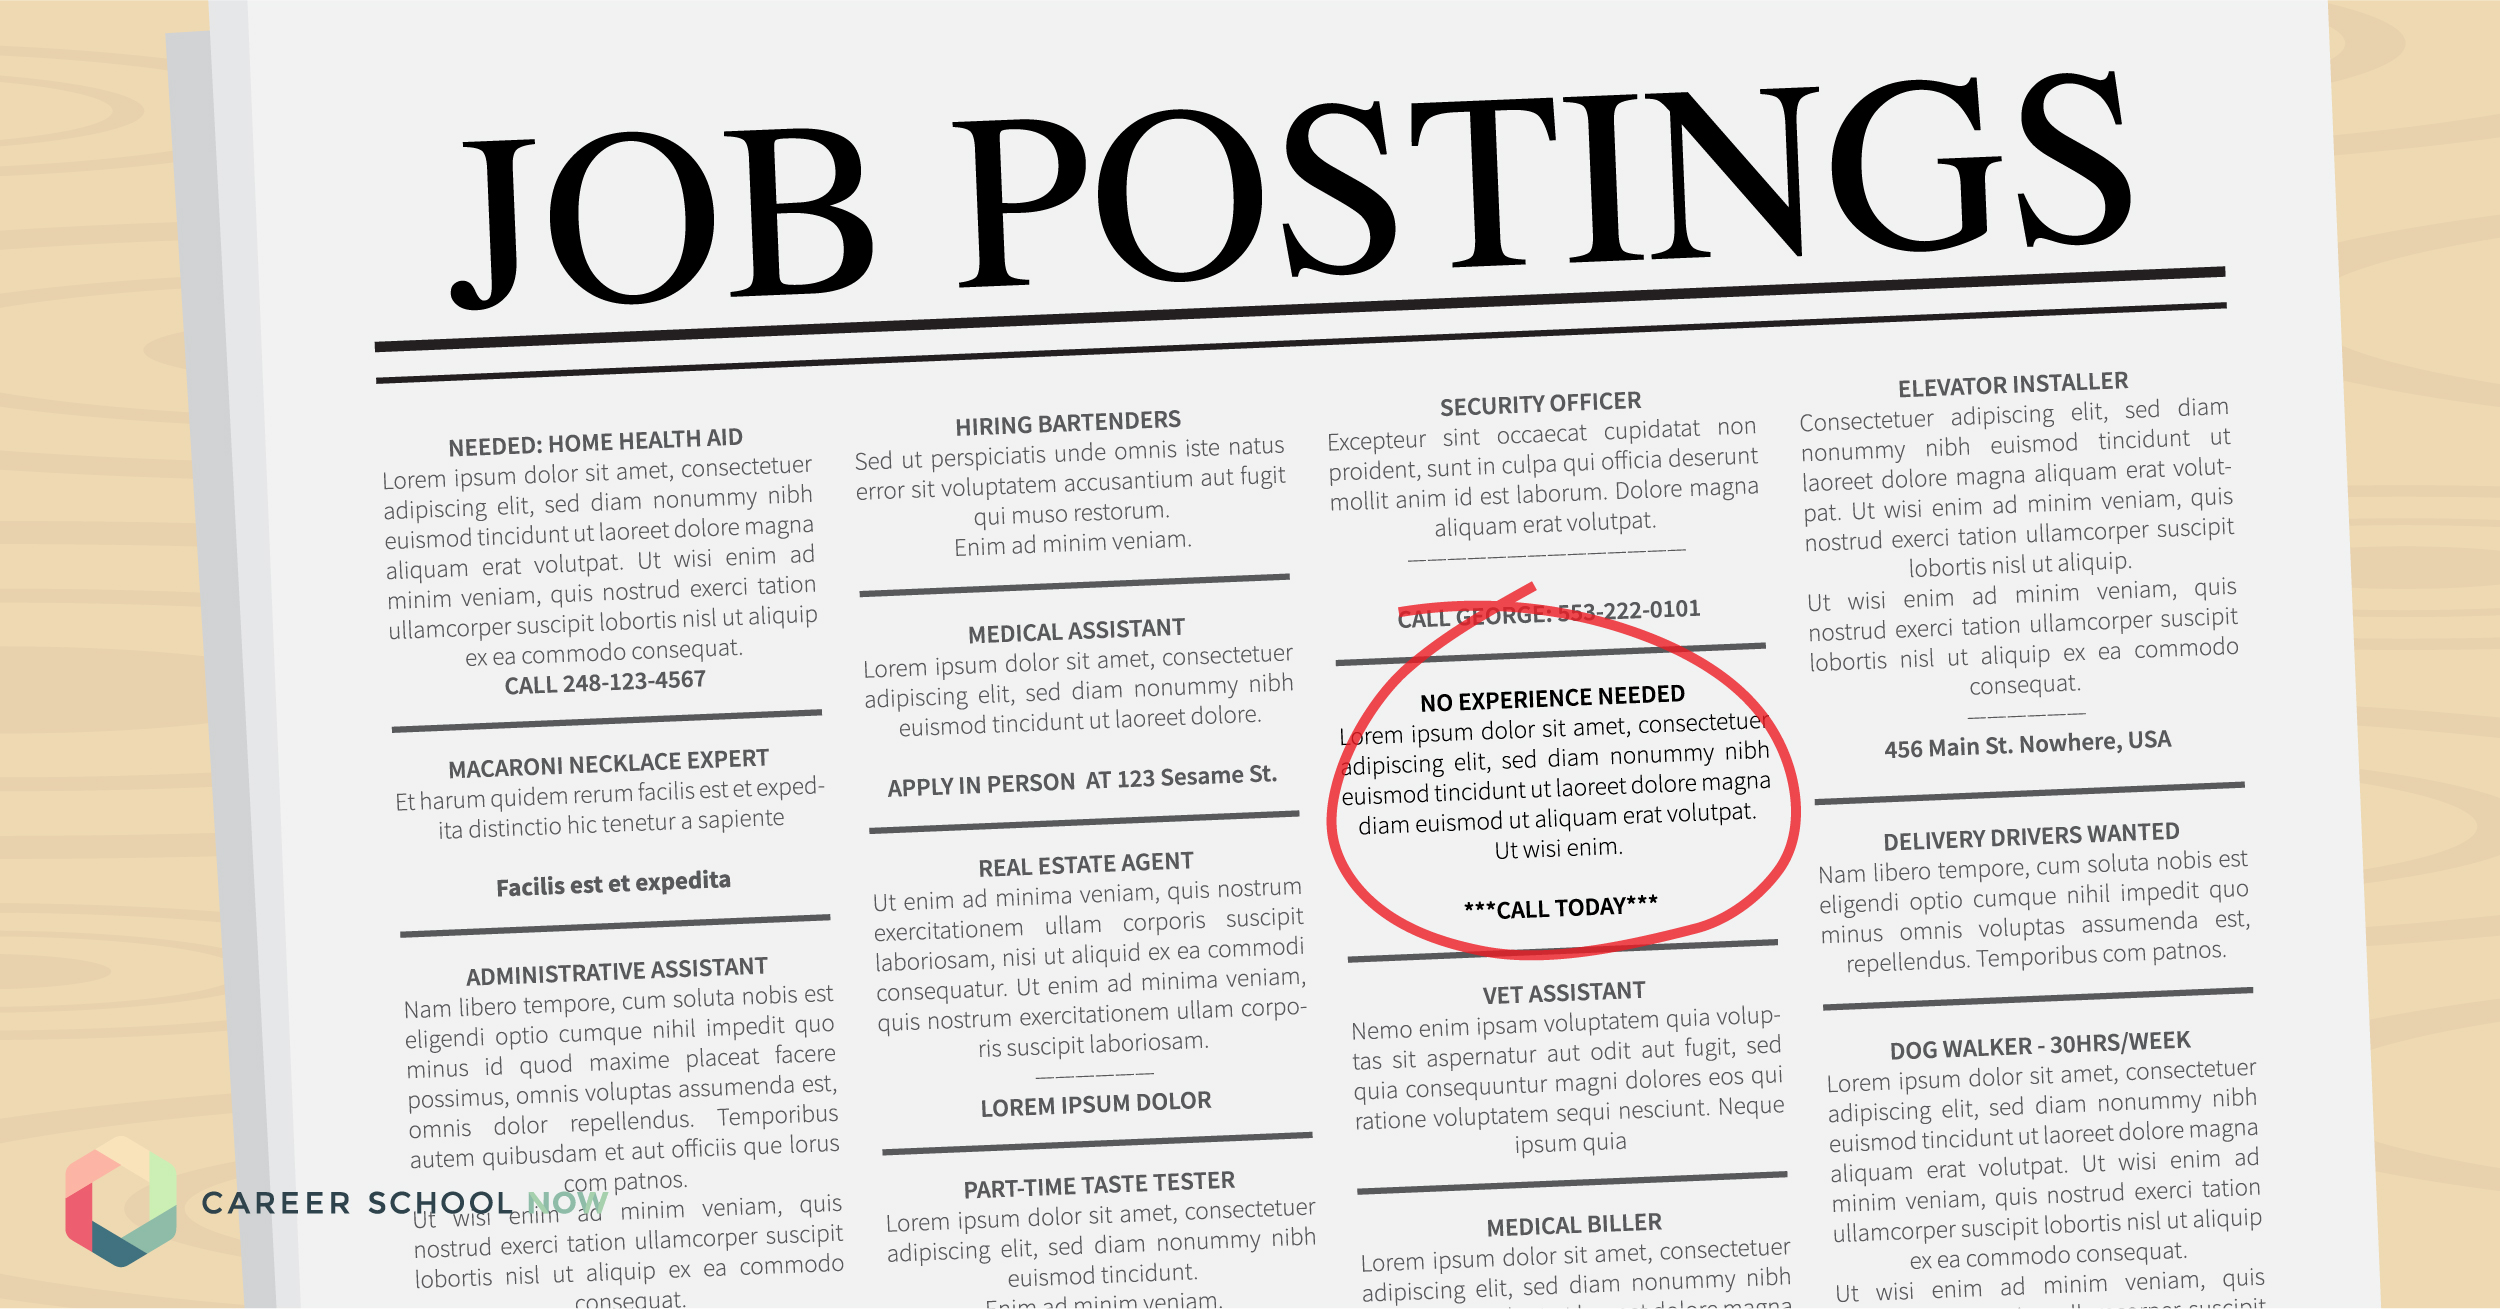 how to find a job when you don't have a lot of experience